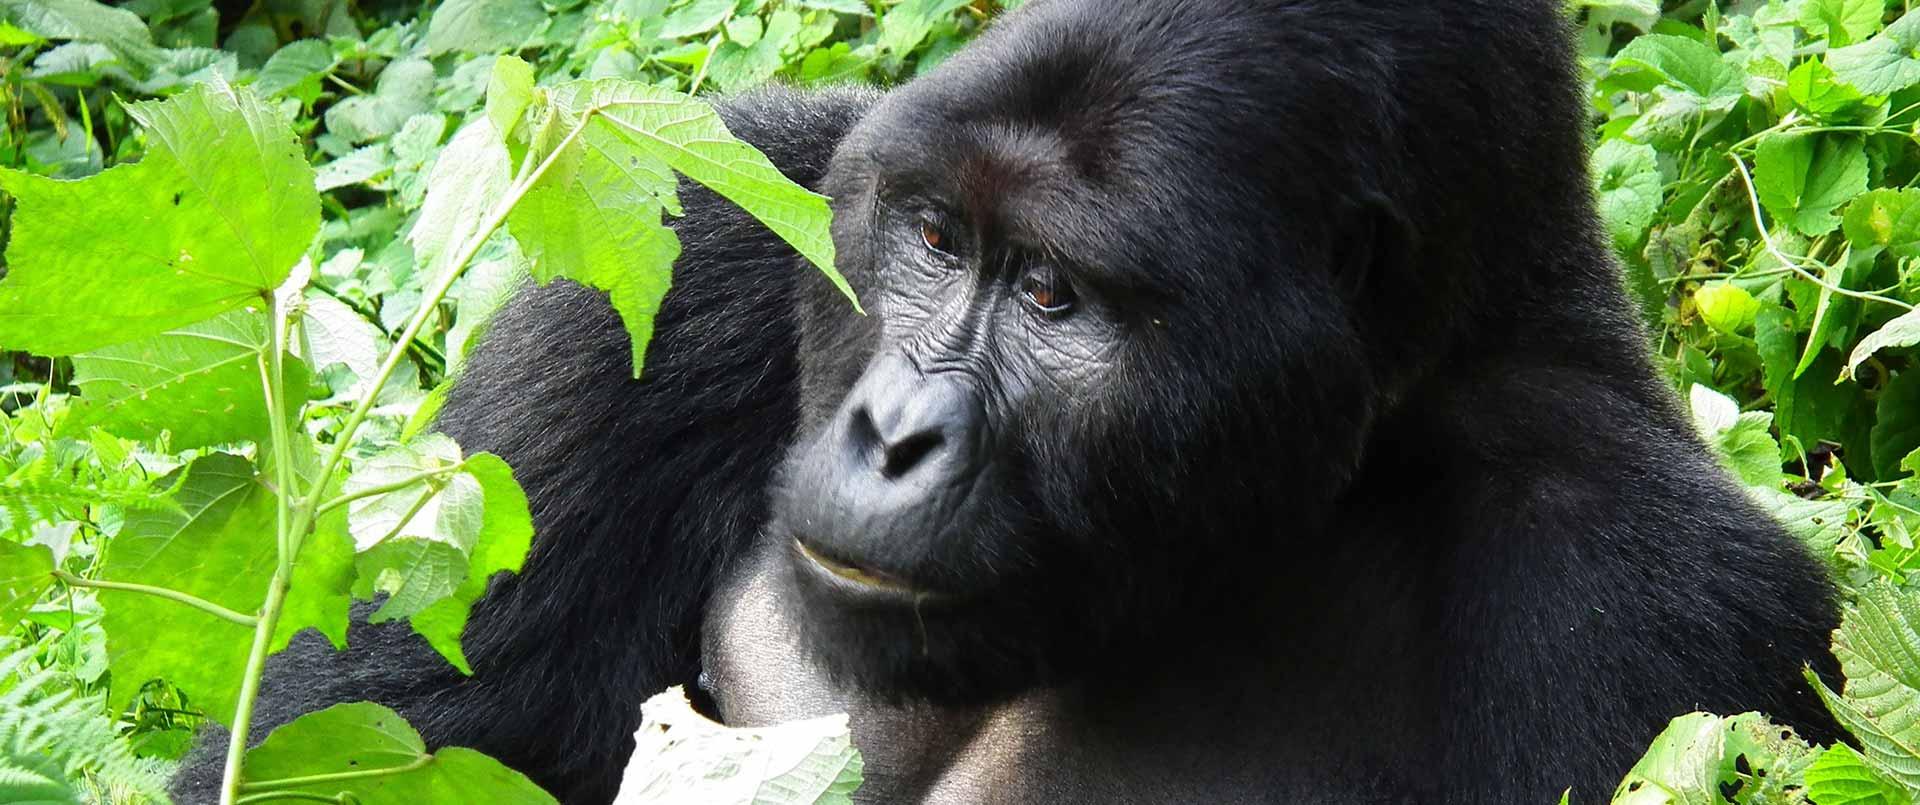 Uganda: Gorillas, Chimps and Wildlife